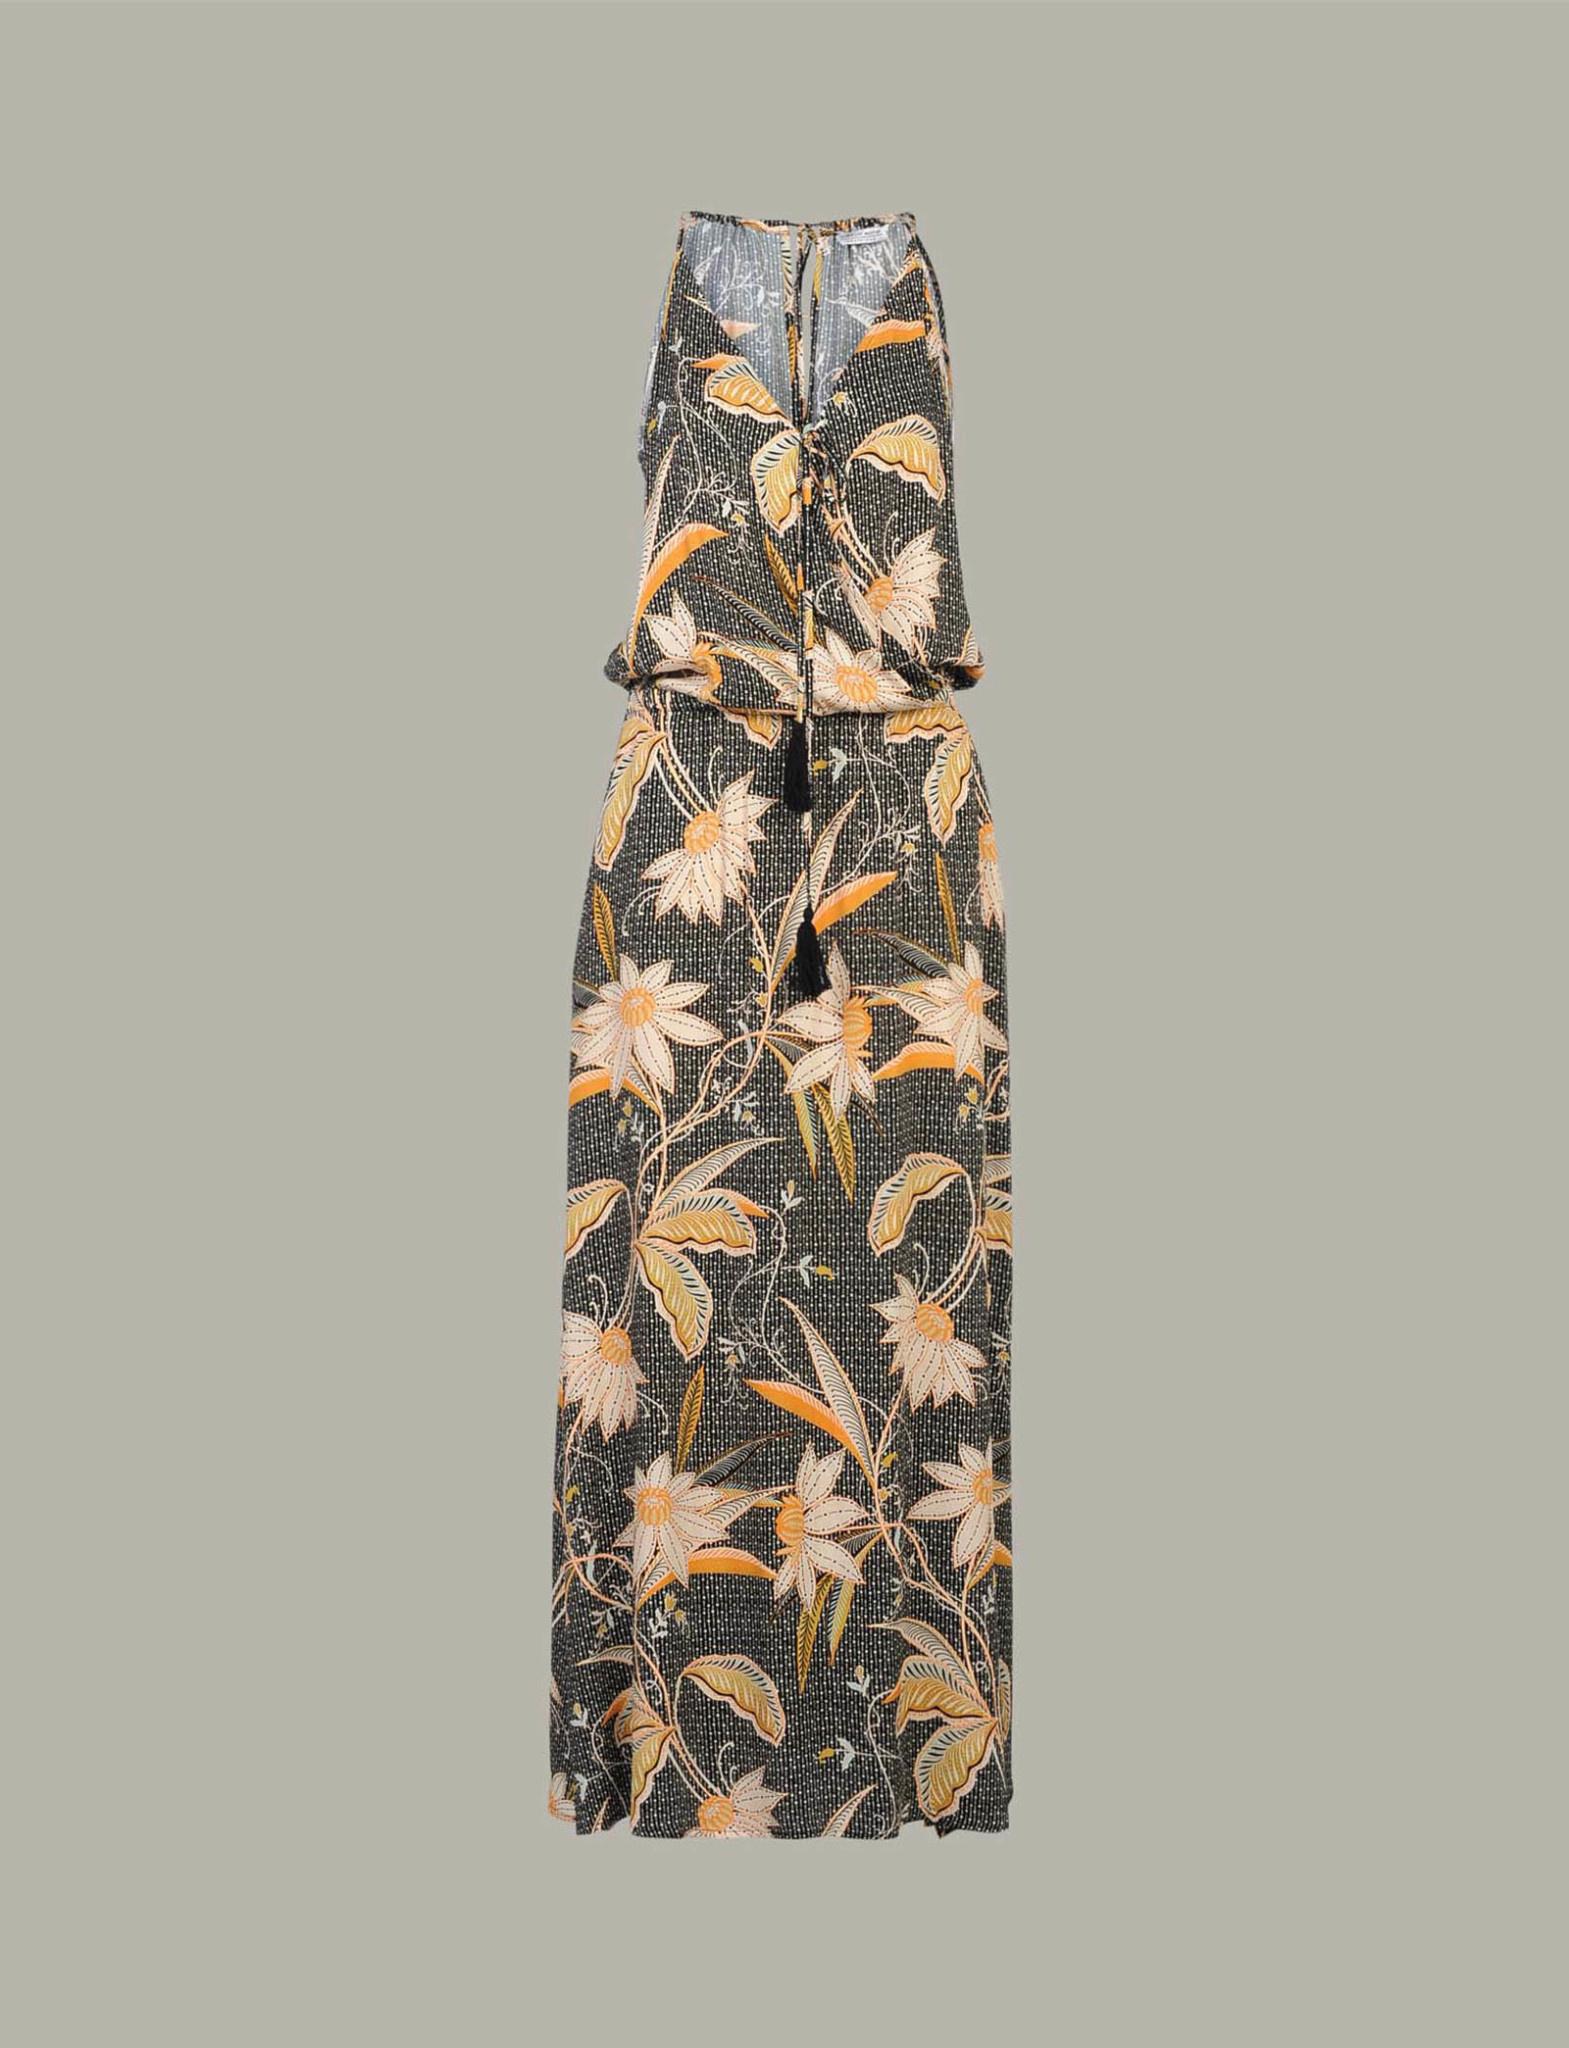 Zwarte dames jurk met print Summum woman - 5s1174 990